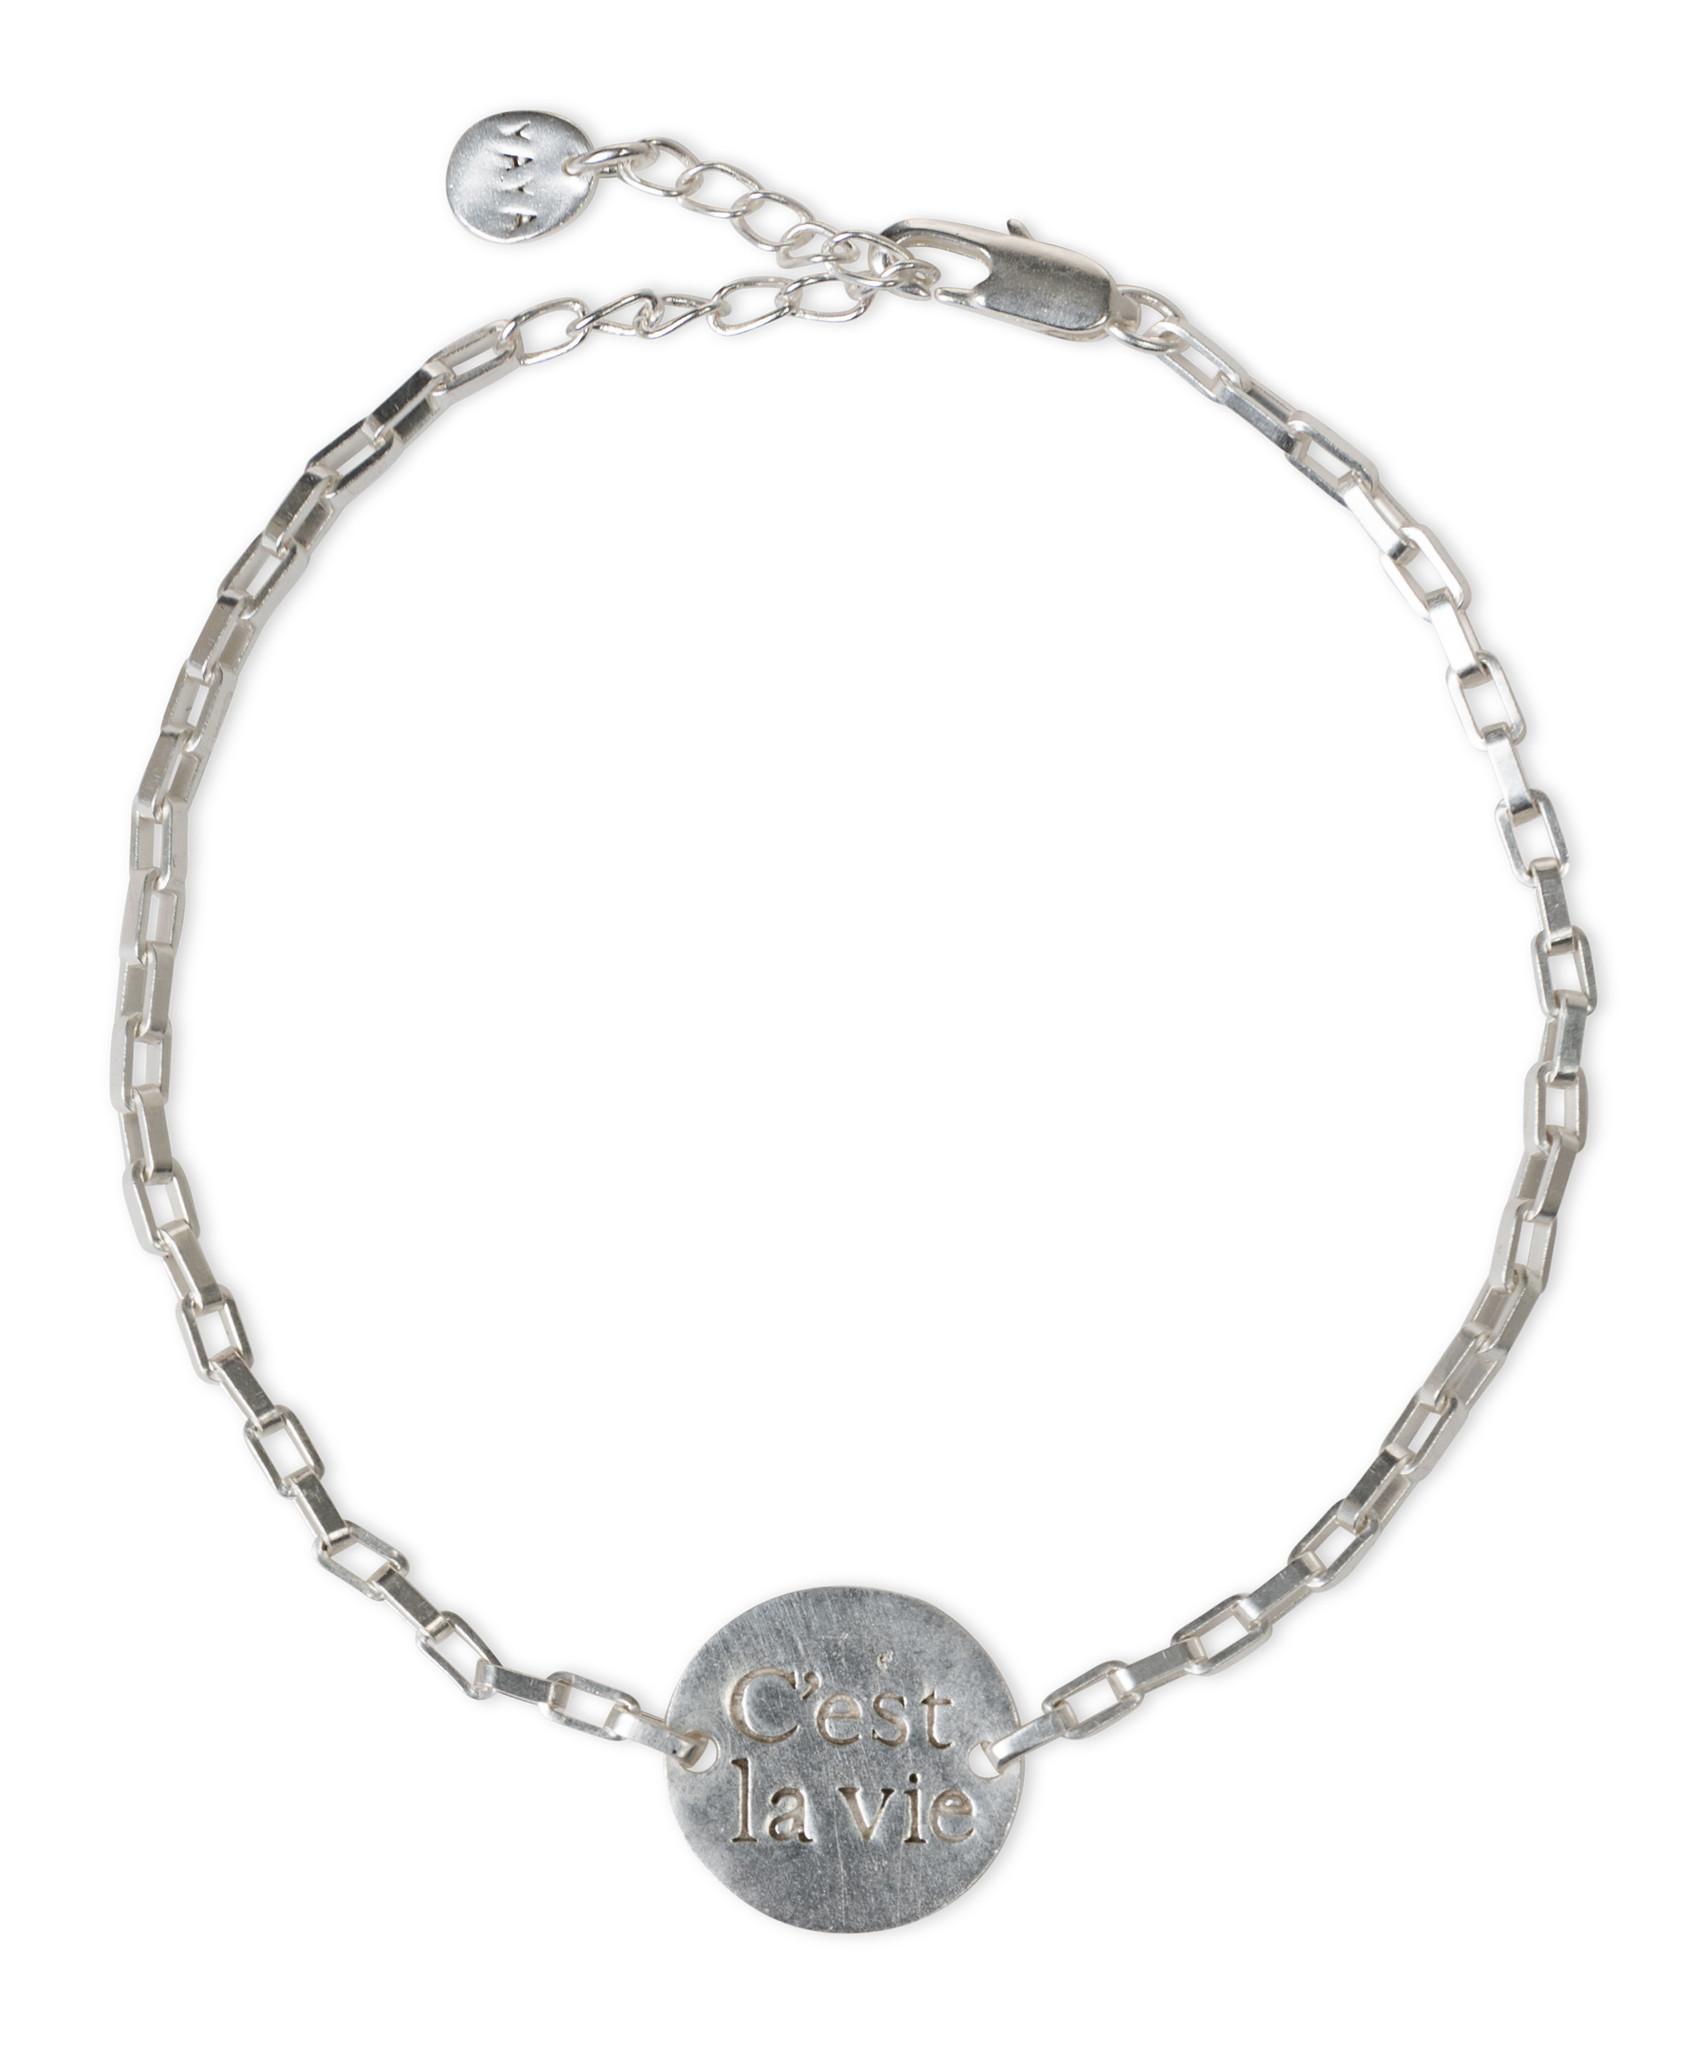 yaya Bracelet with coin 133386-014-1